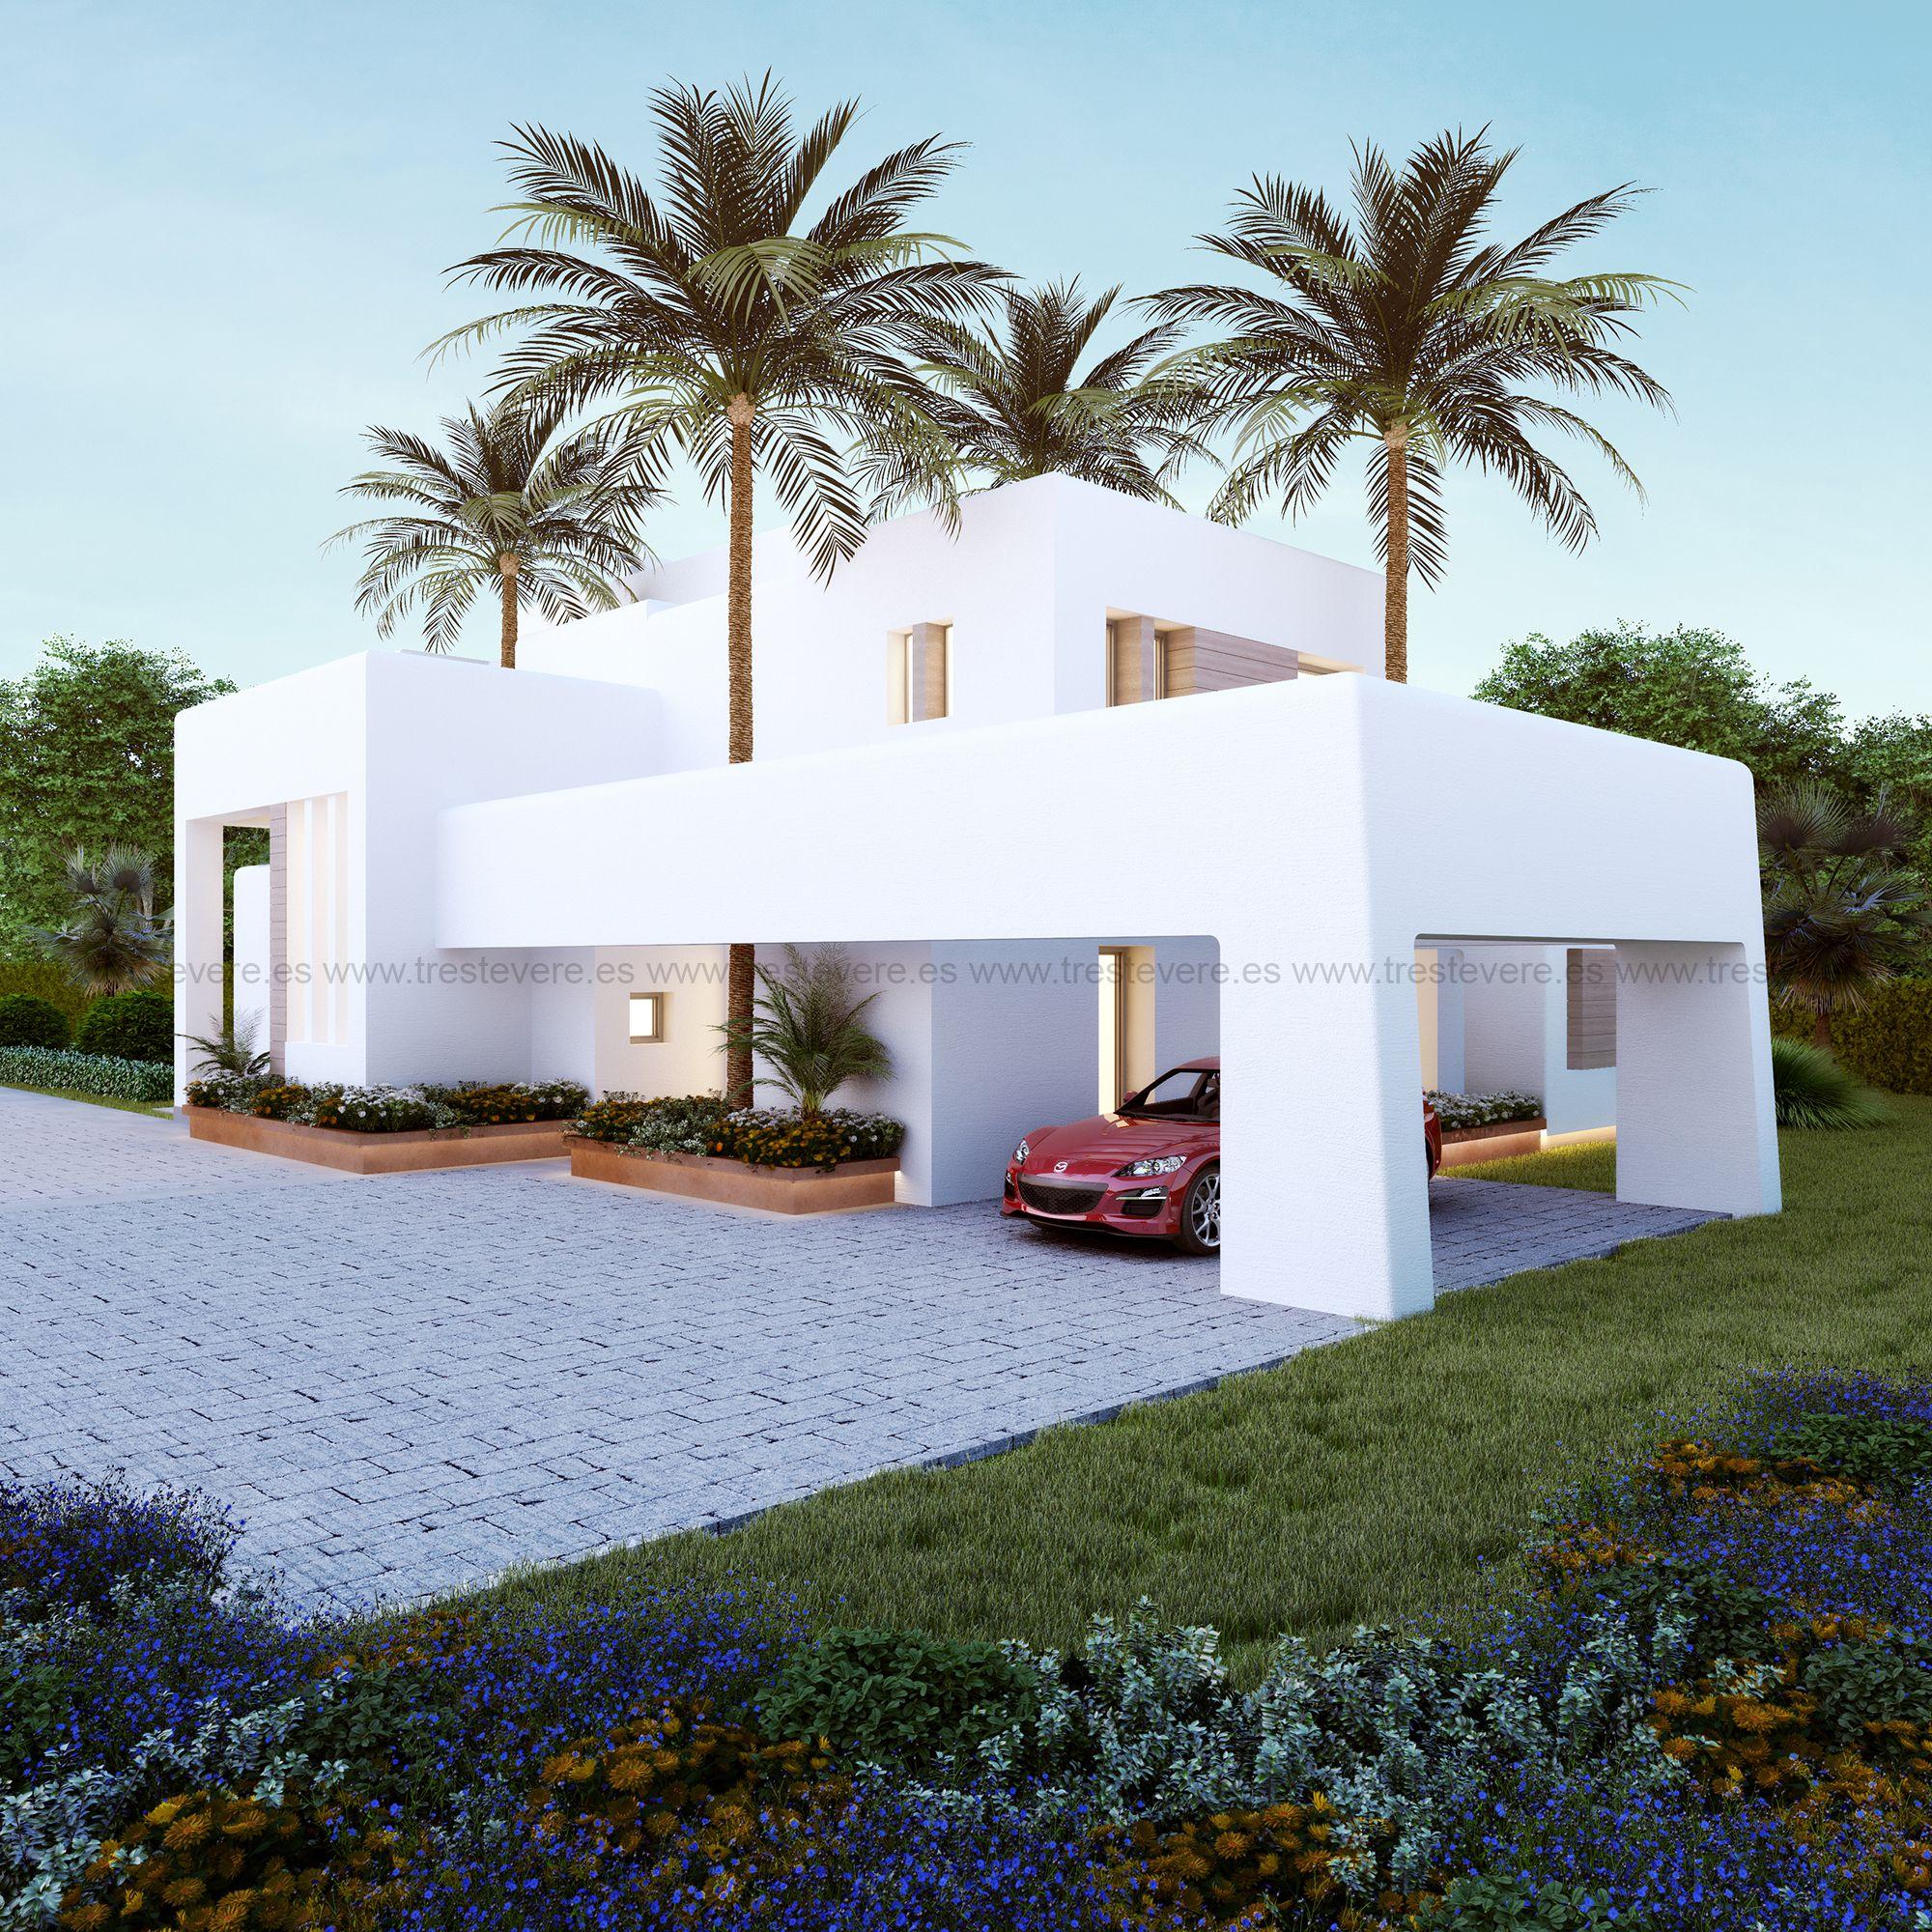 Vivienda moderna 04 arquitectura y dise o en 2019 for Casa moderna habbo 2017